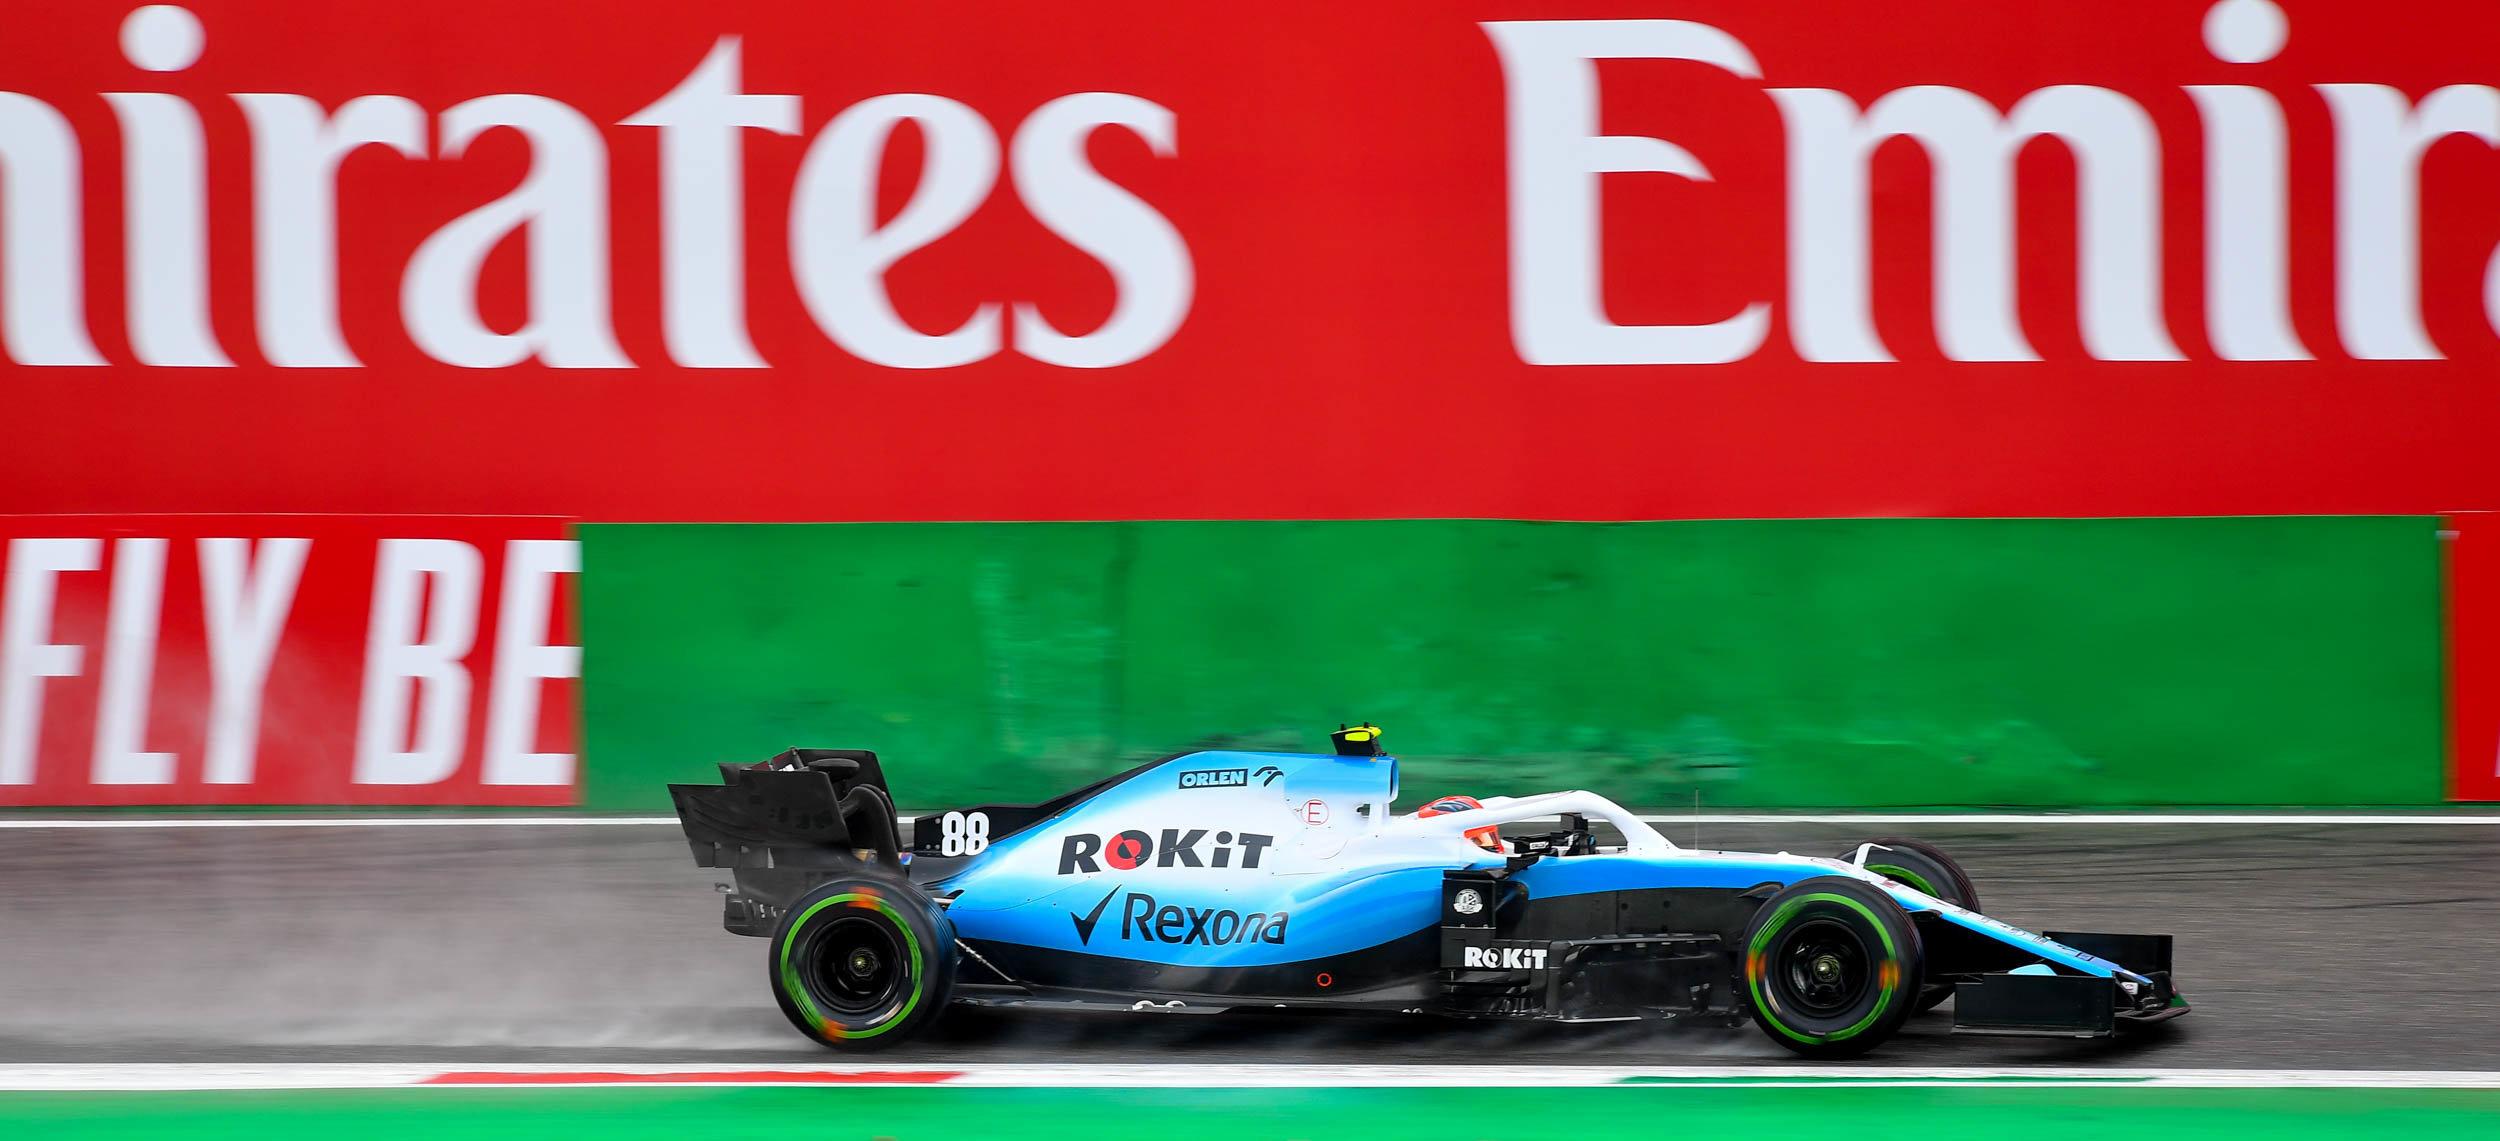 Williams #88 : Robert Kubica